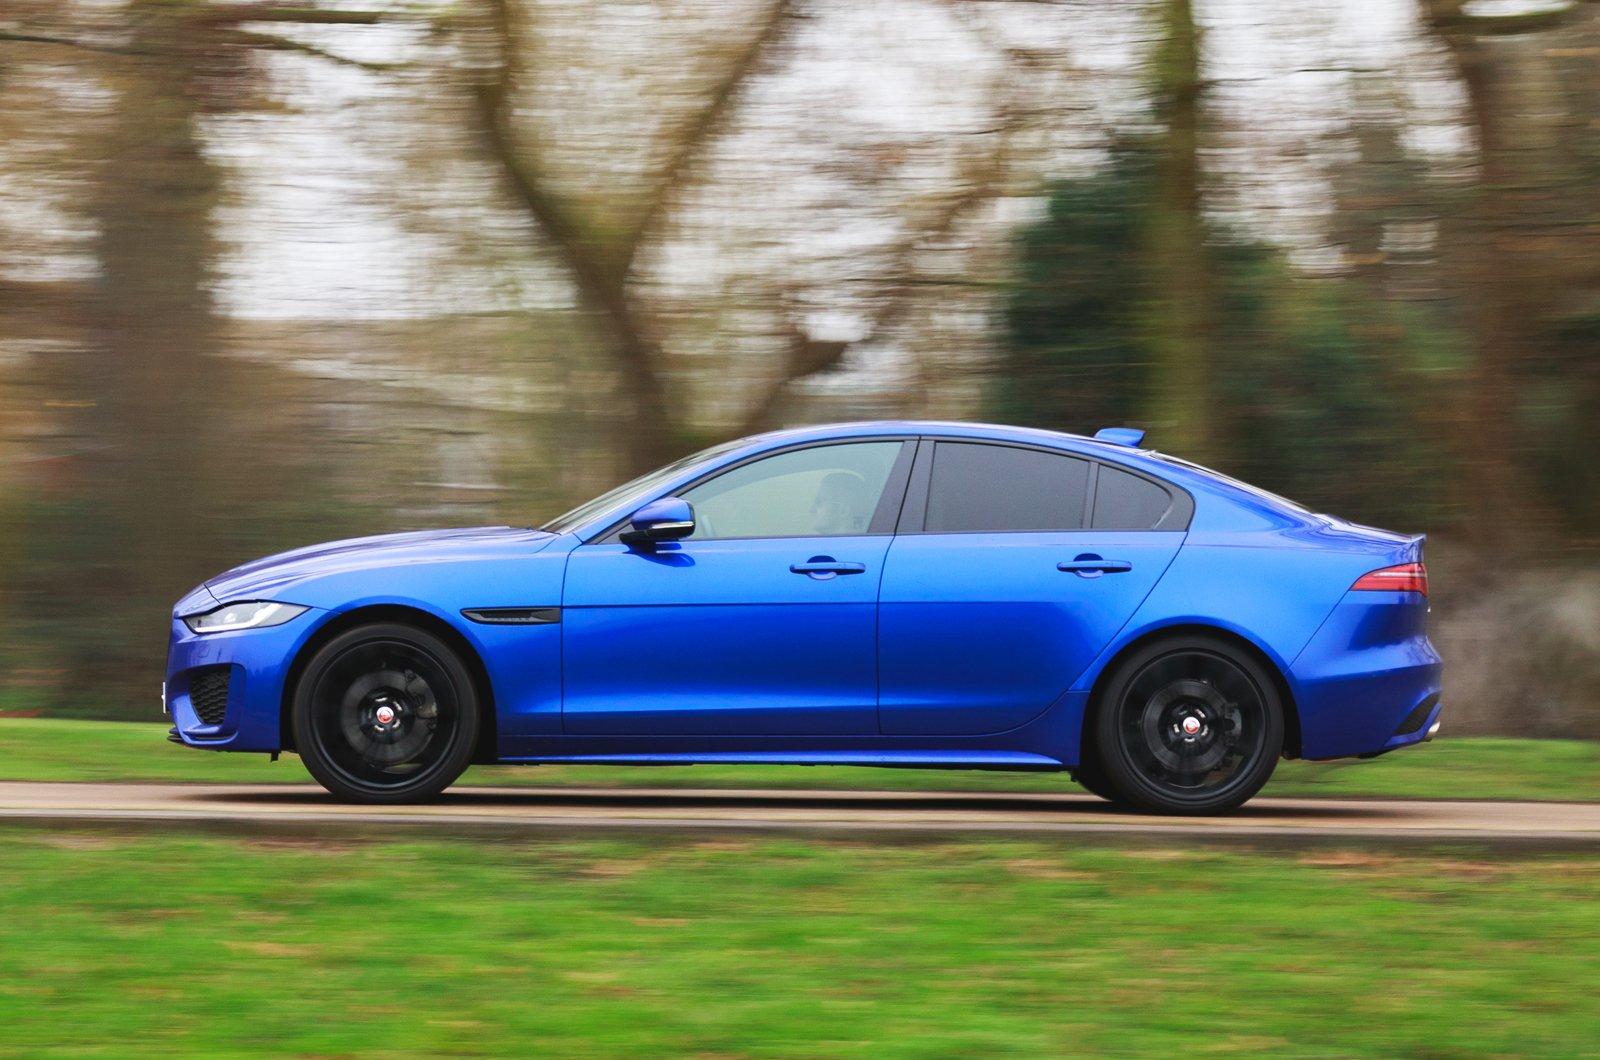 LT Jaguar XE side